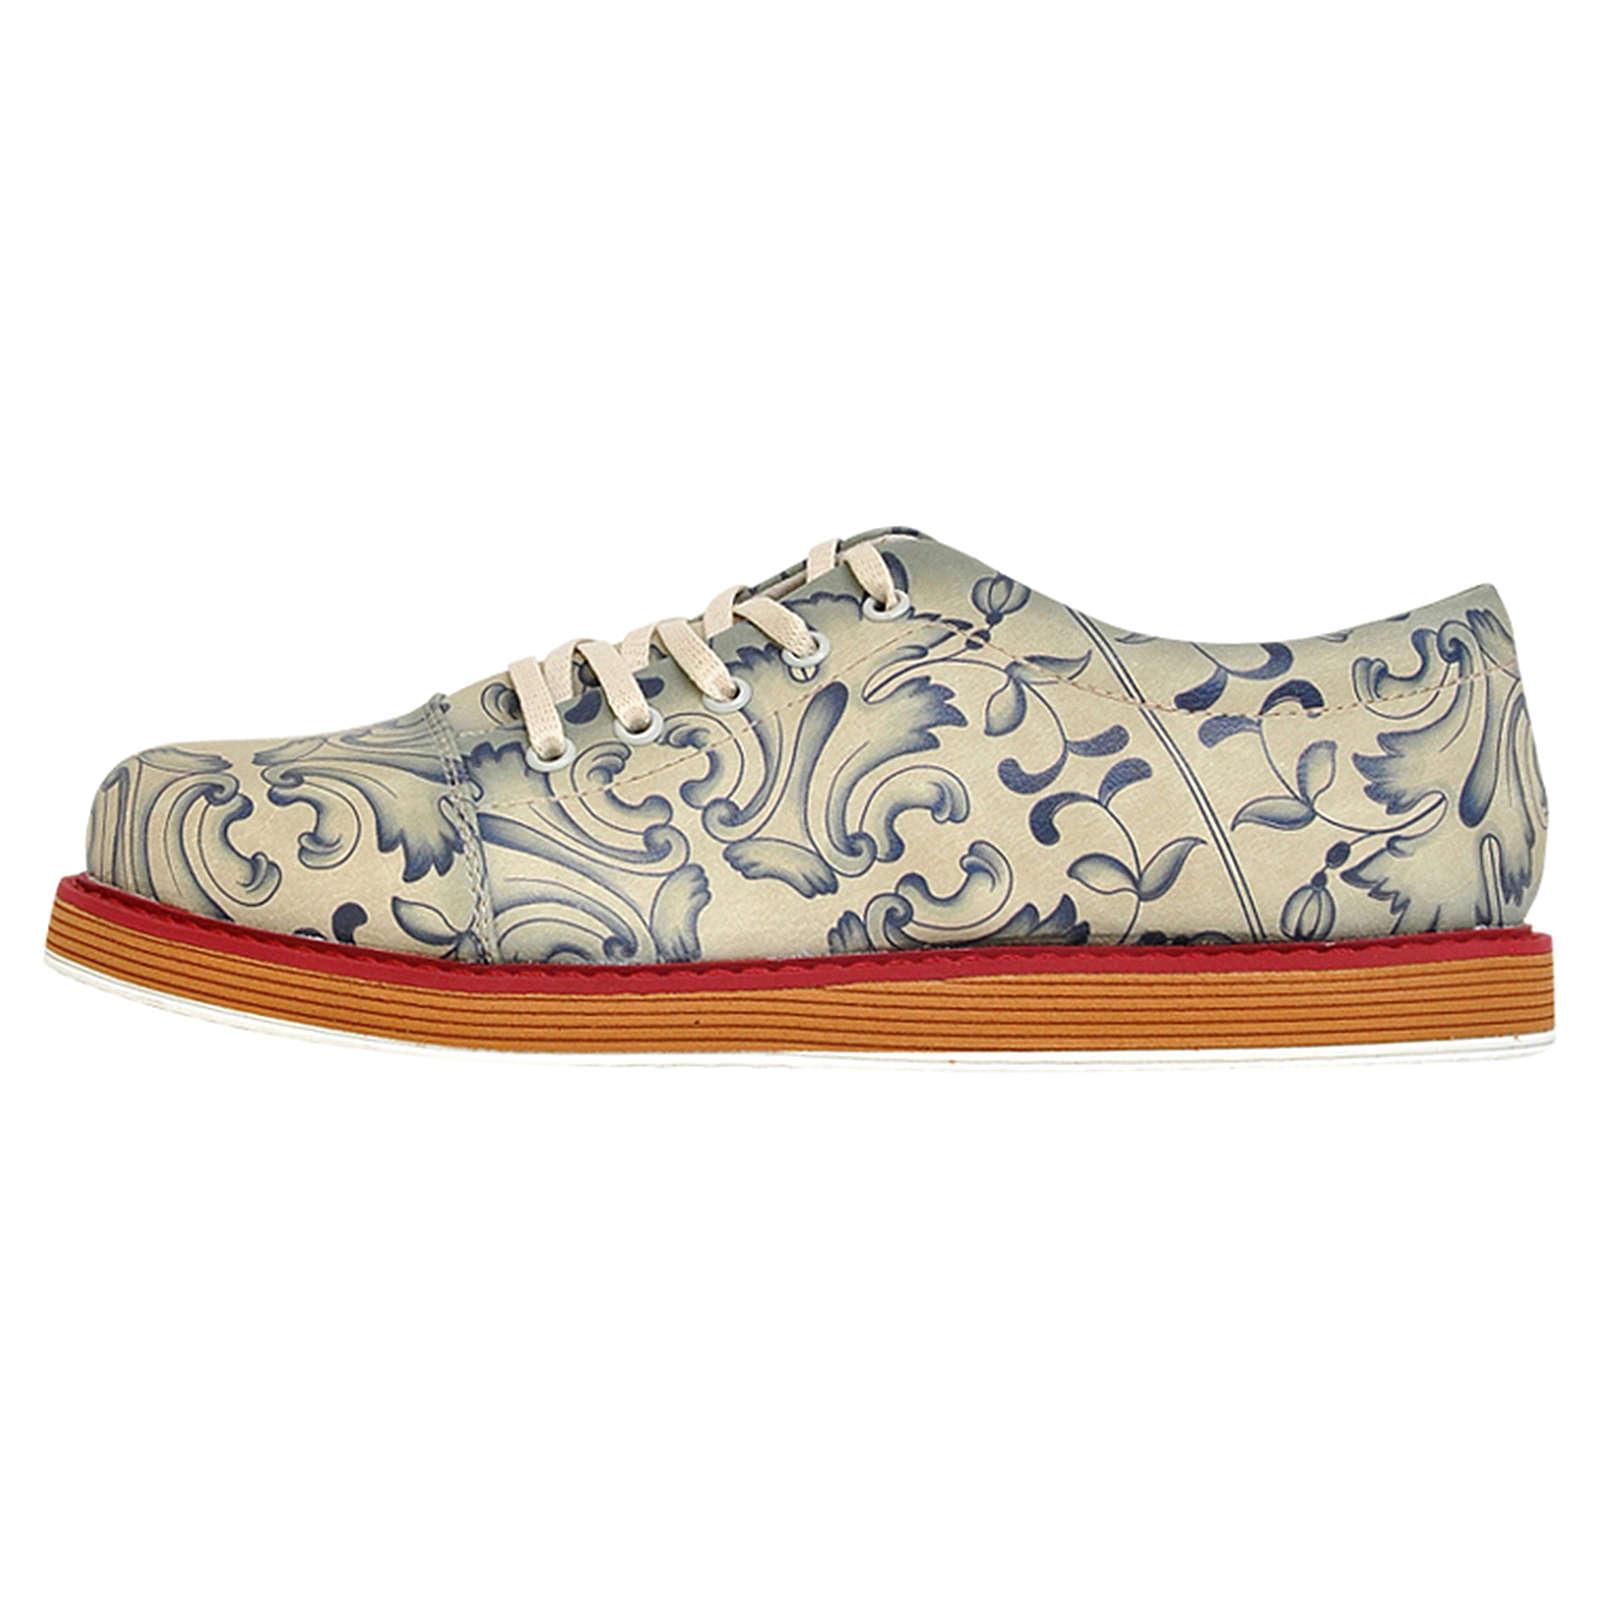 Dogo Shoes Schnürschuhe Lisbon mehrfarbig Damen...